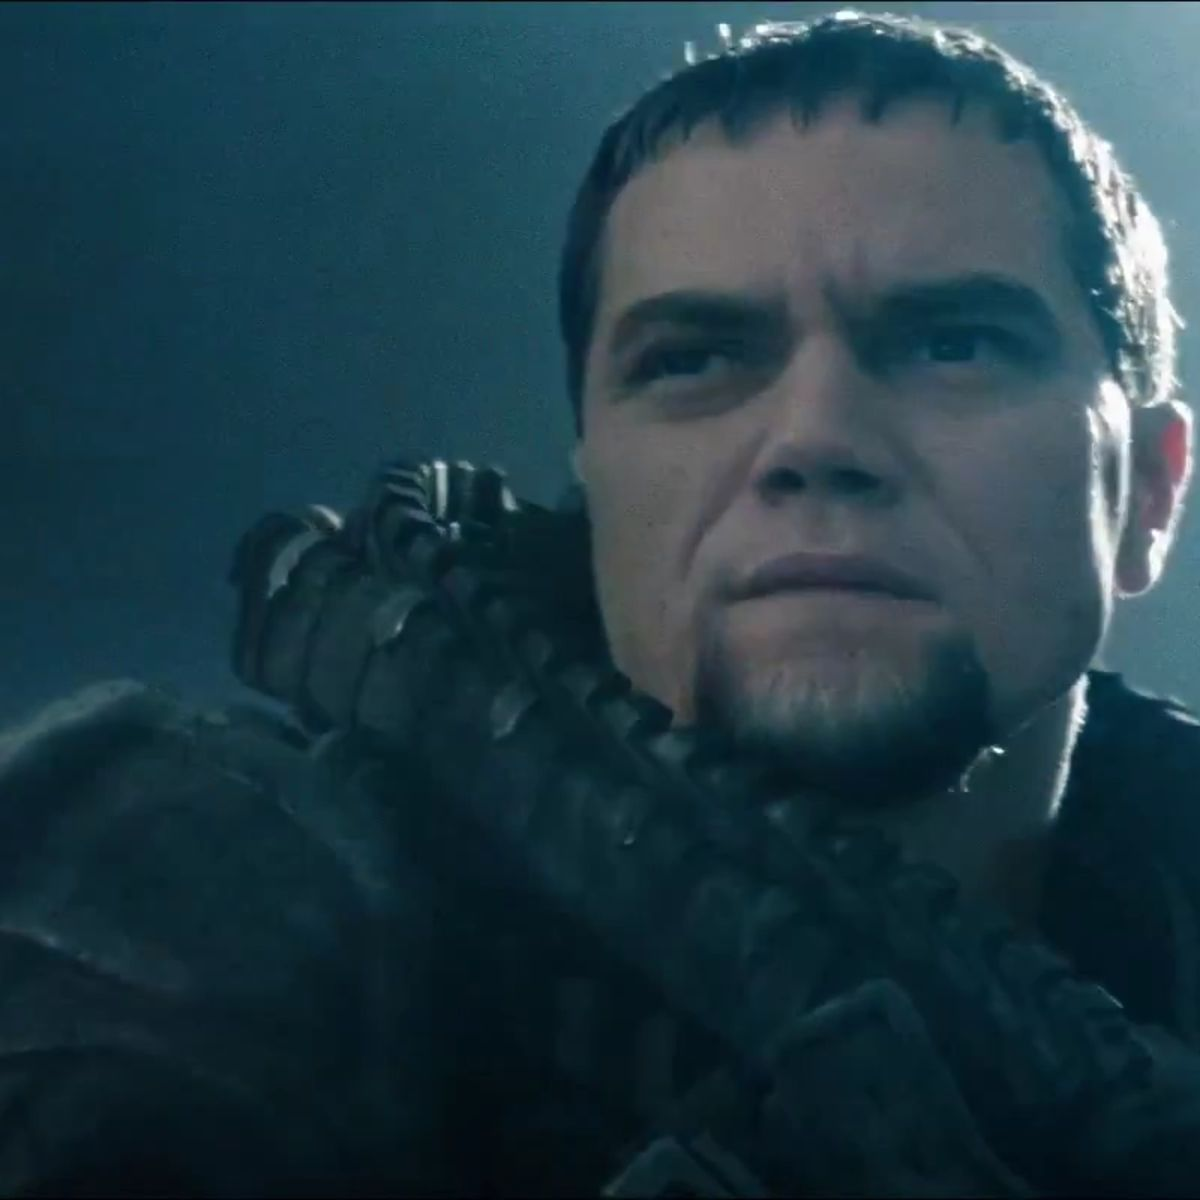 Man-of-Steel-Trailer-Images-Michael-Shannon-as-General-Zod.jpg